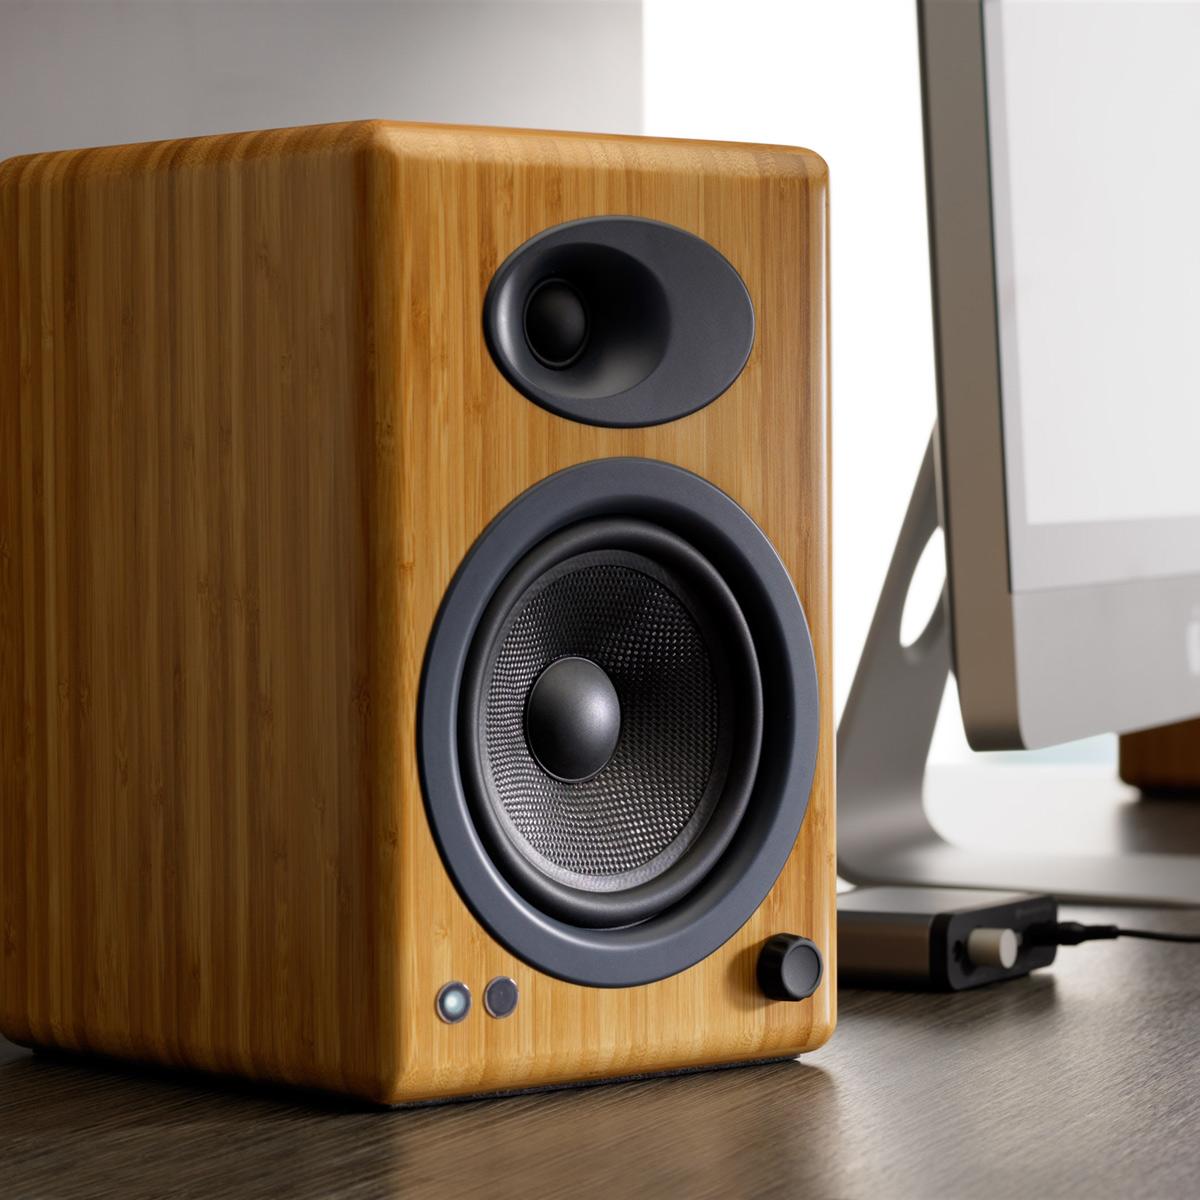 Audioengine-A5-Classic-Powered-Bookshelf-Speakers-Pair thumbnail 5